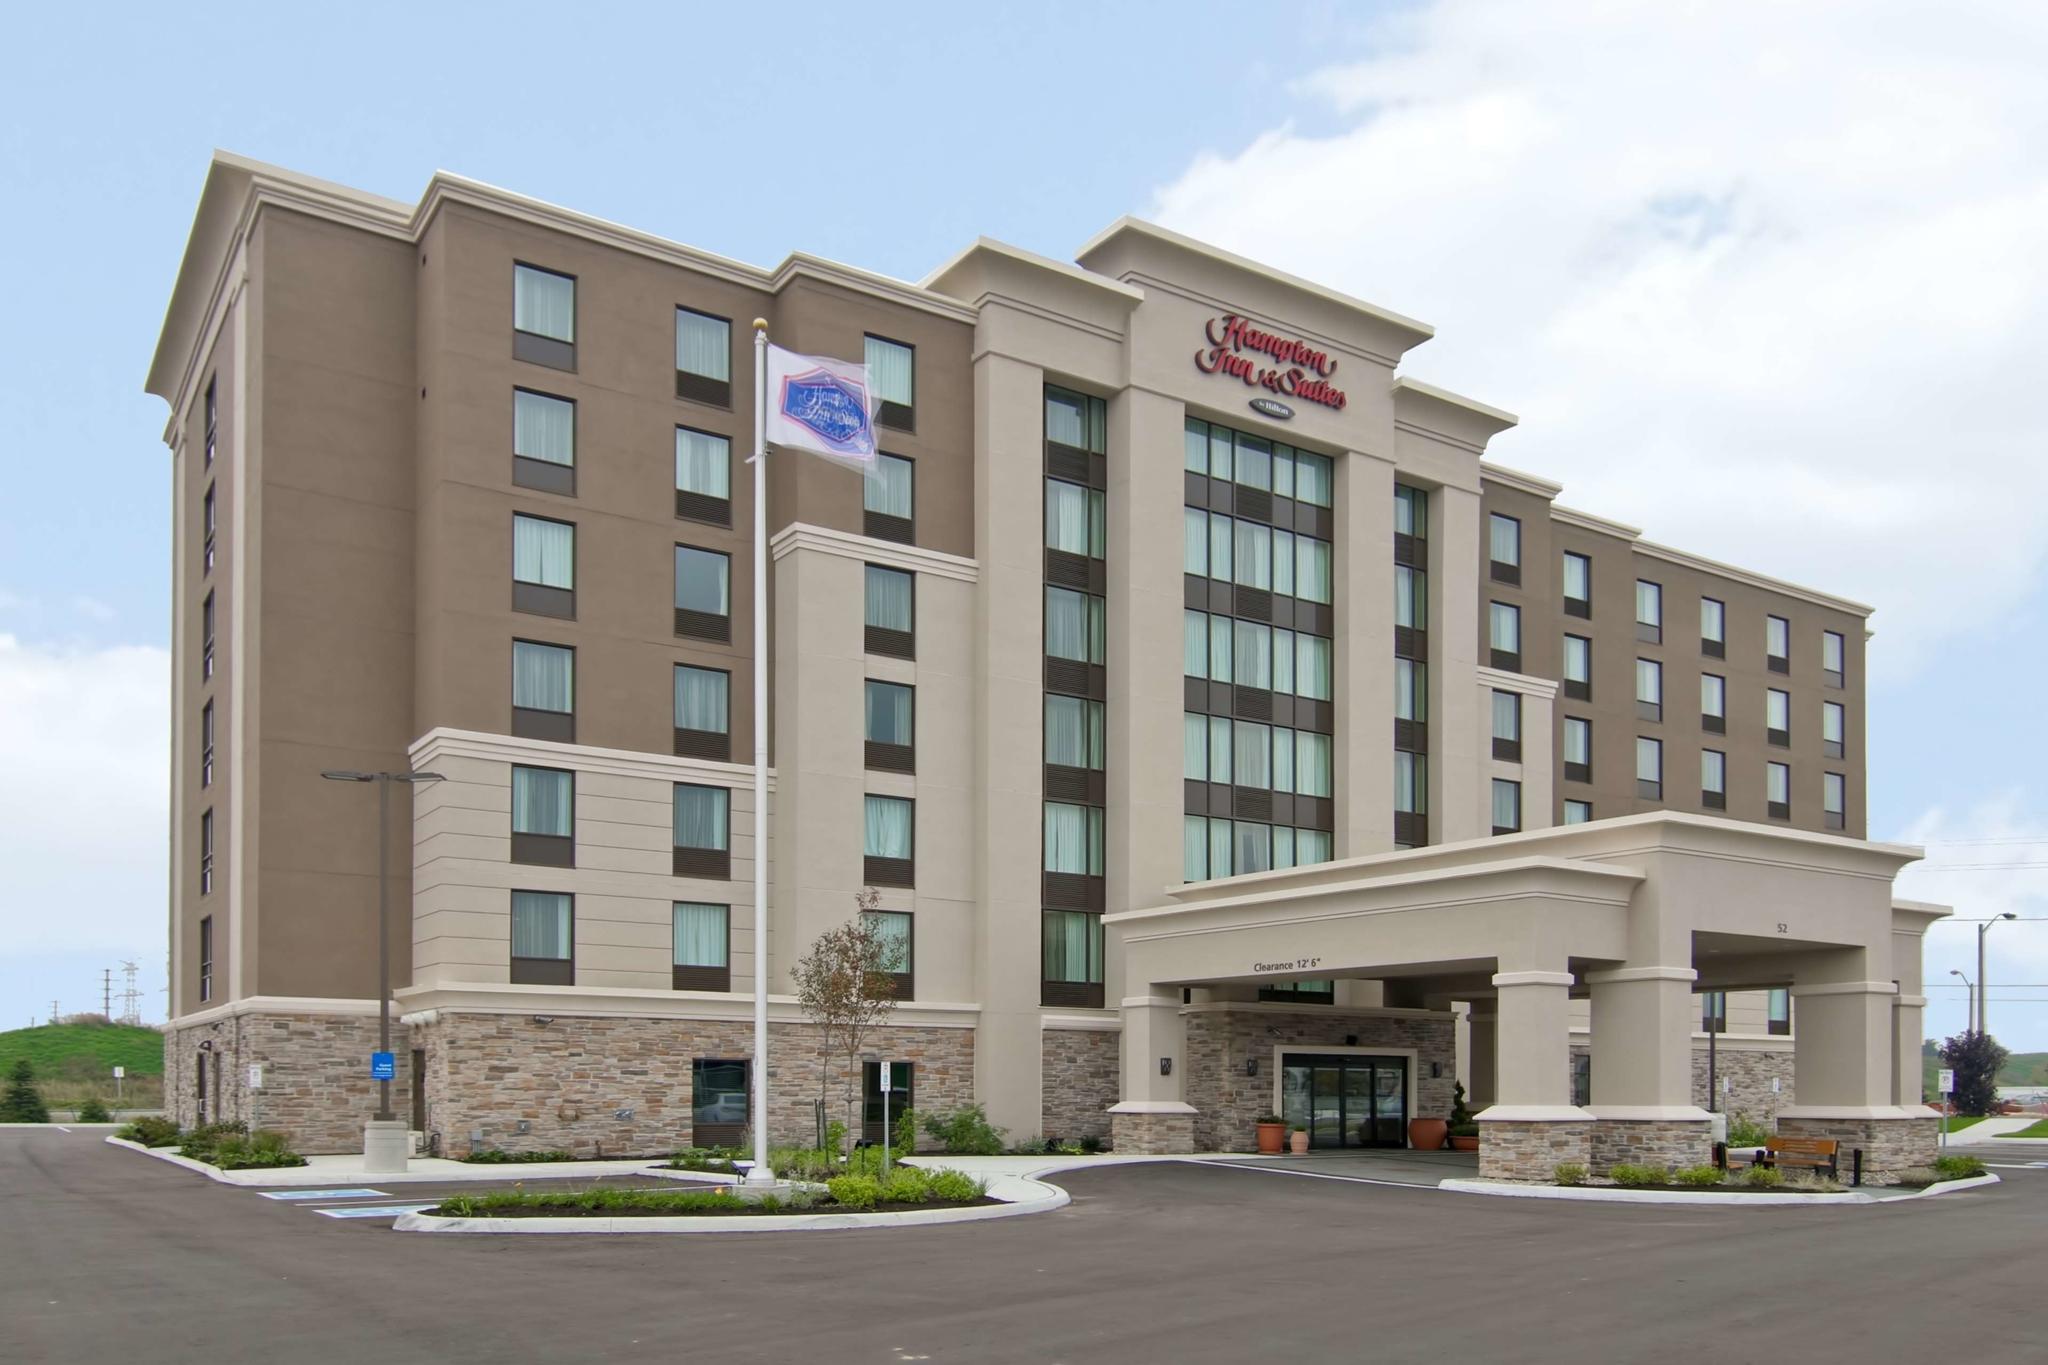 Hampton Inn & Suites by Hilton Toronto Markham - Hotels